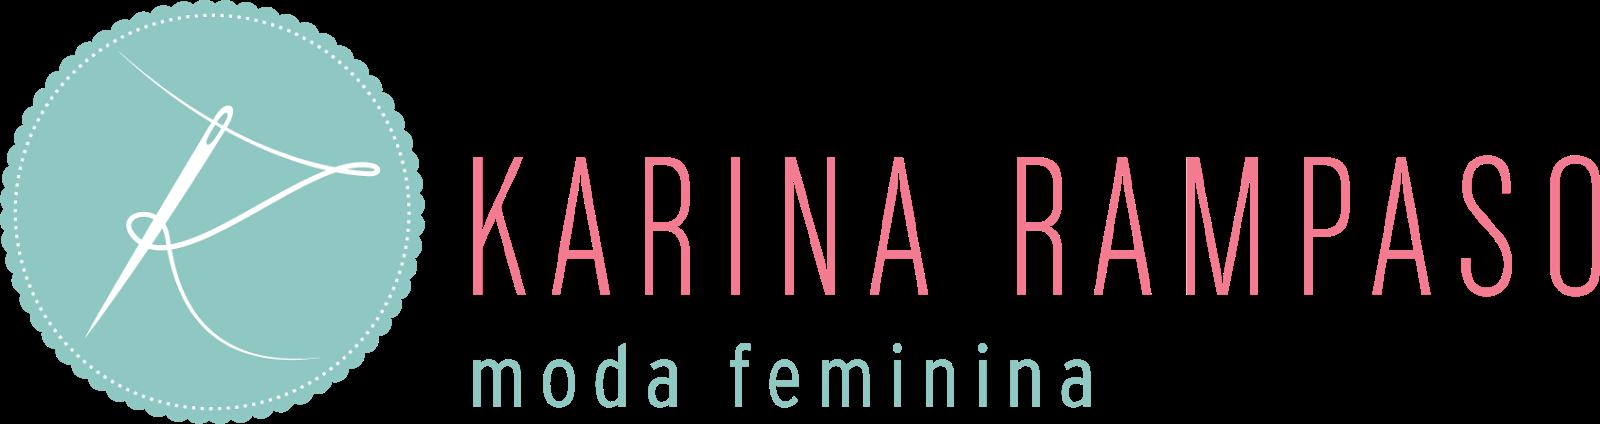 Karina Rampaso - Moda Evangélica